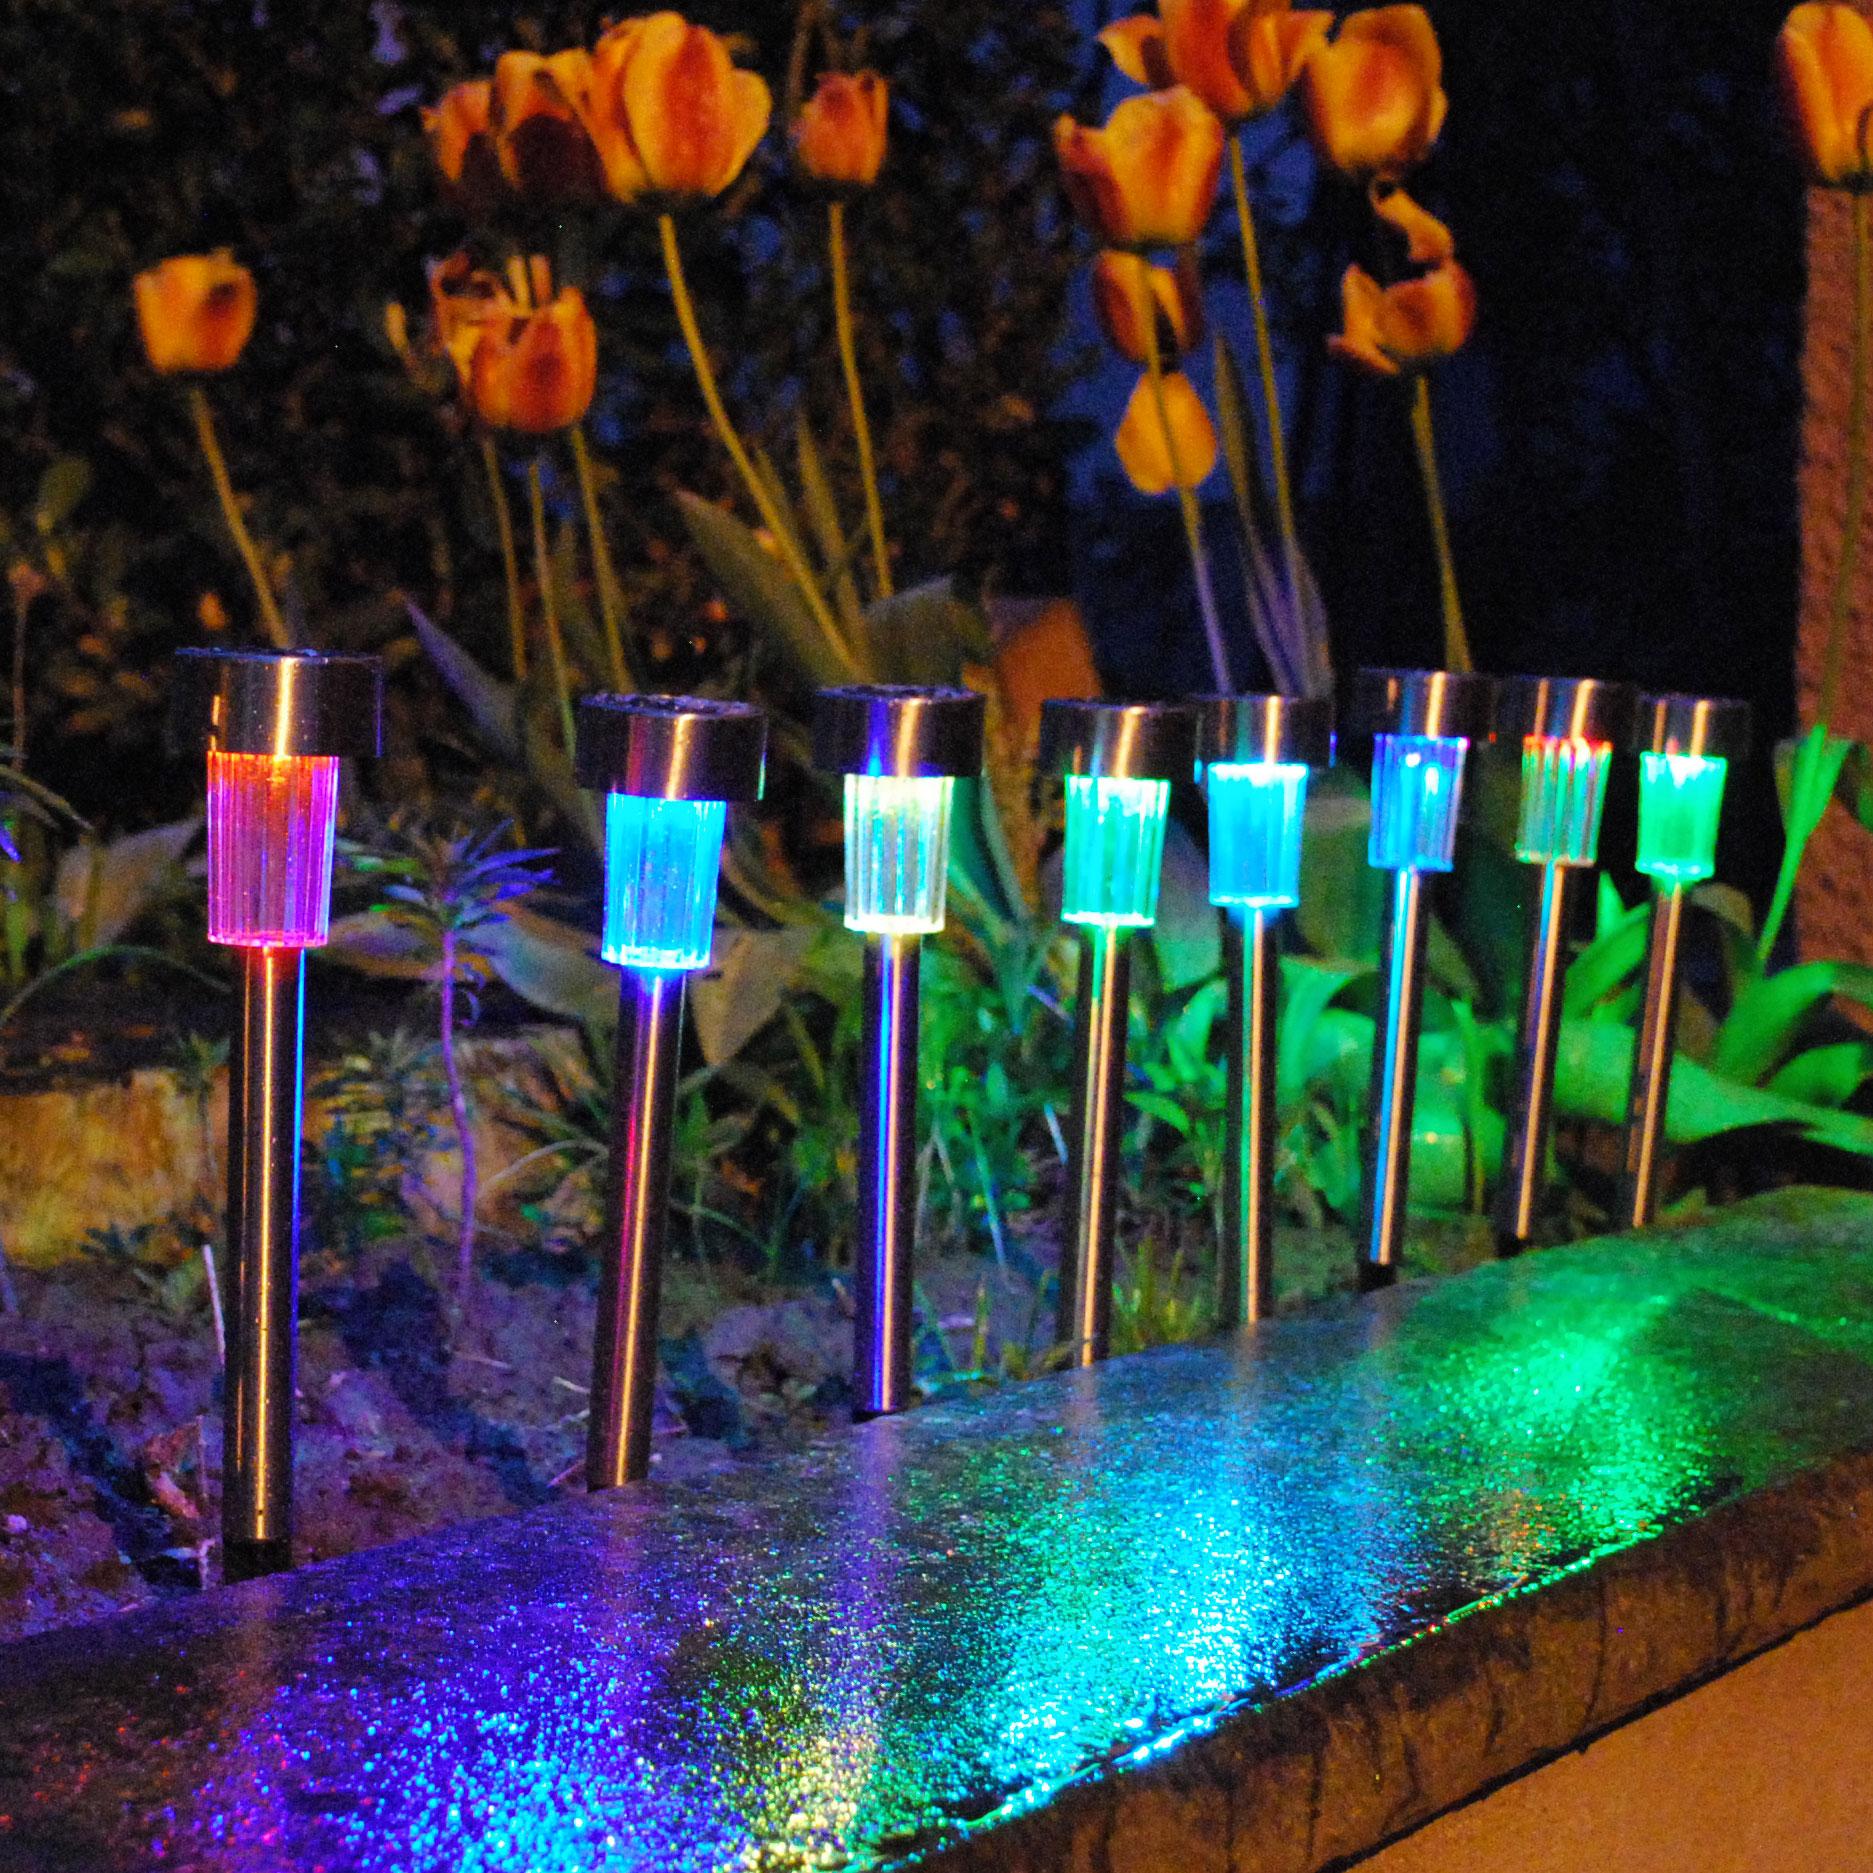 Galix 8 lanternes solaires multicolores en inox - Comparer avec ...